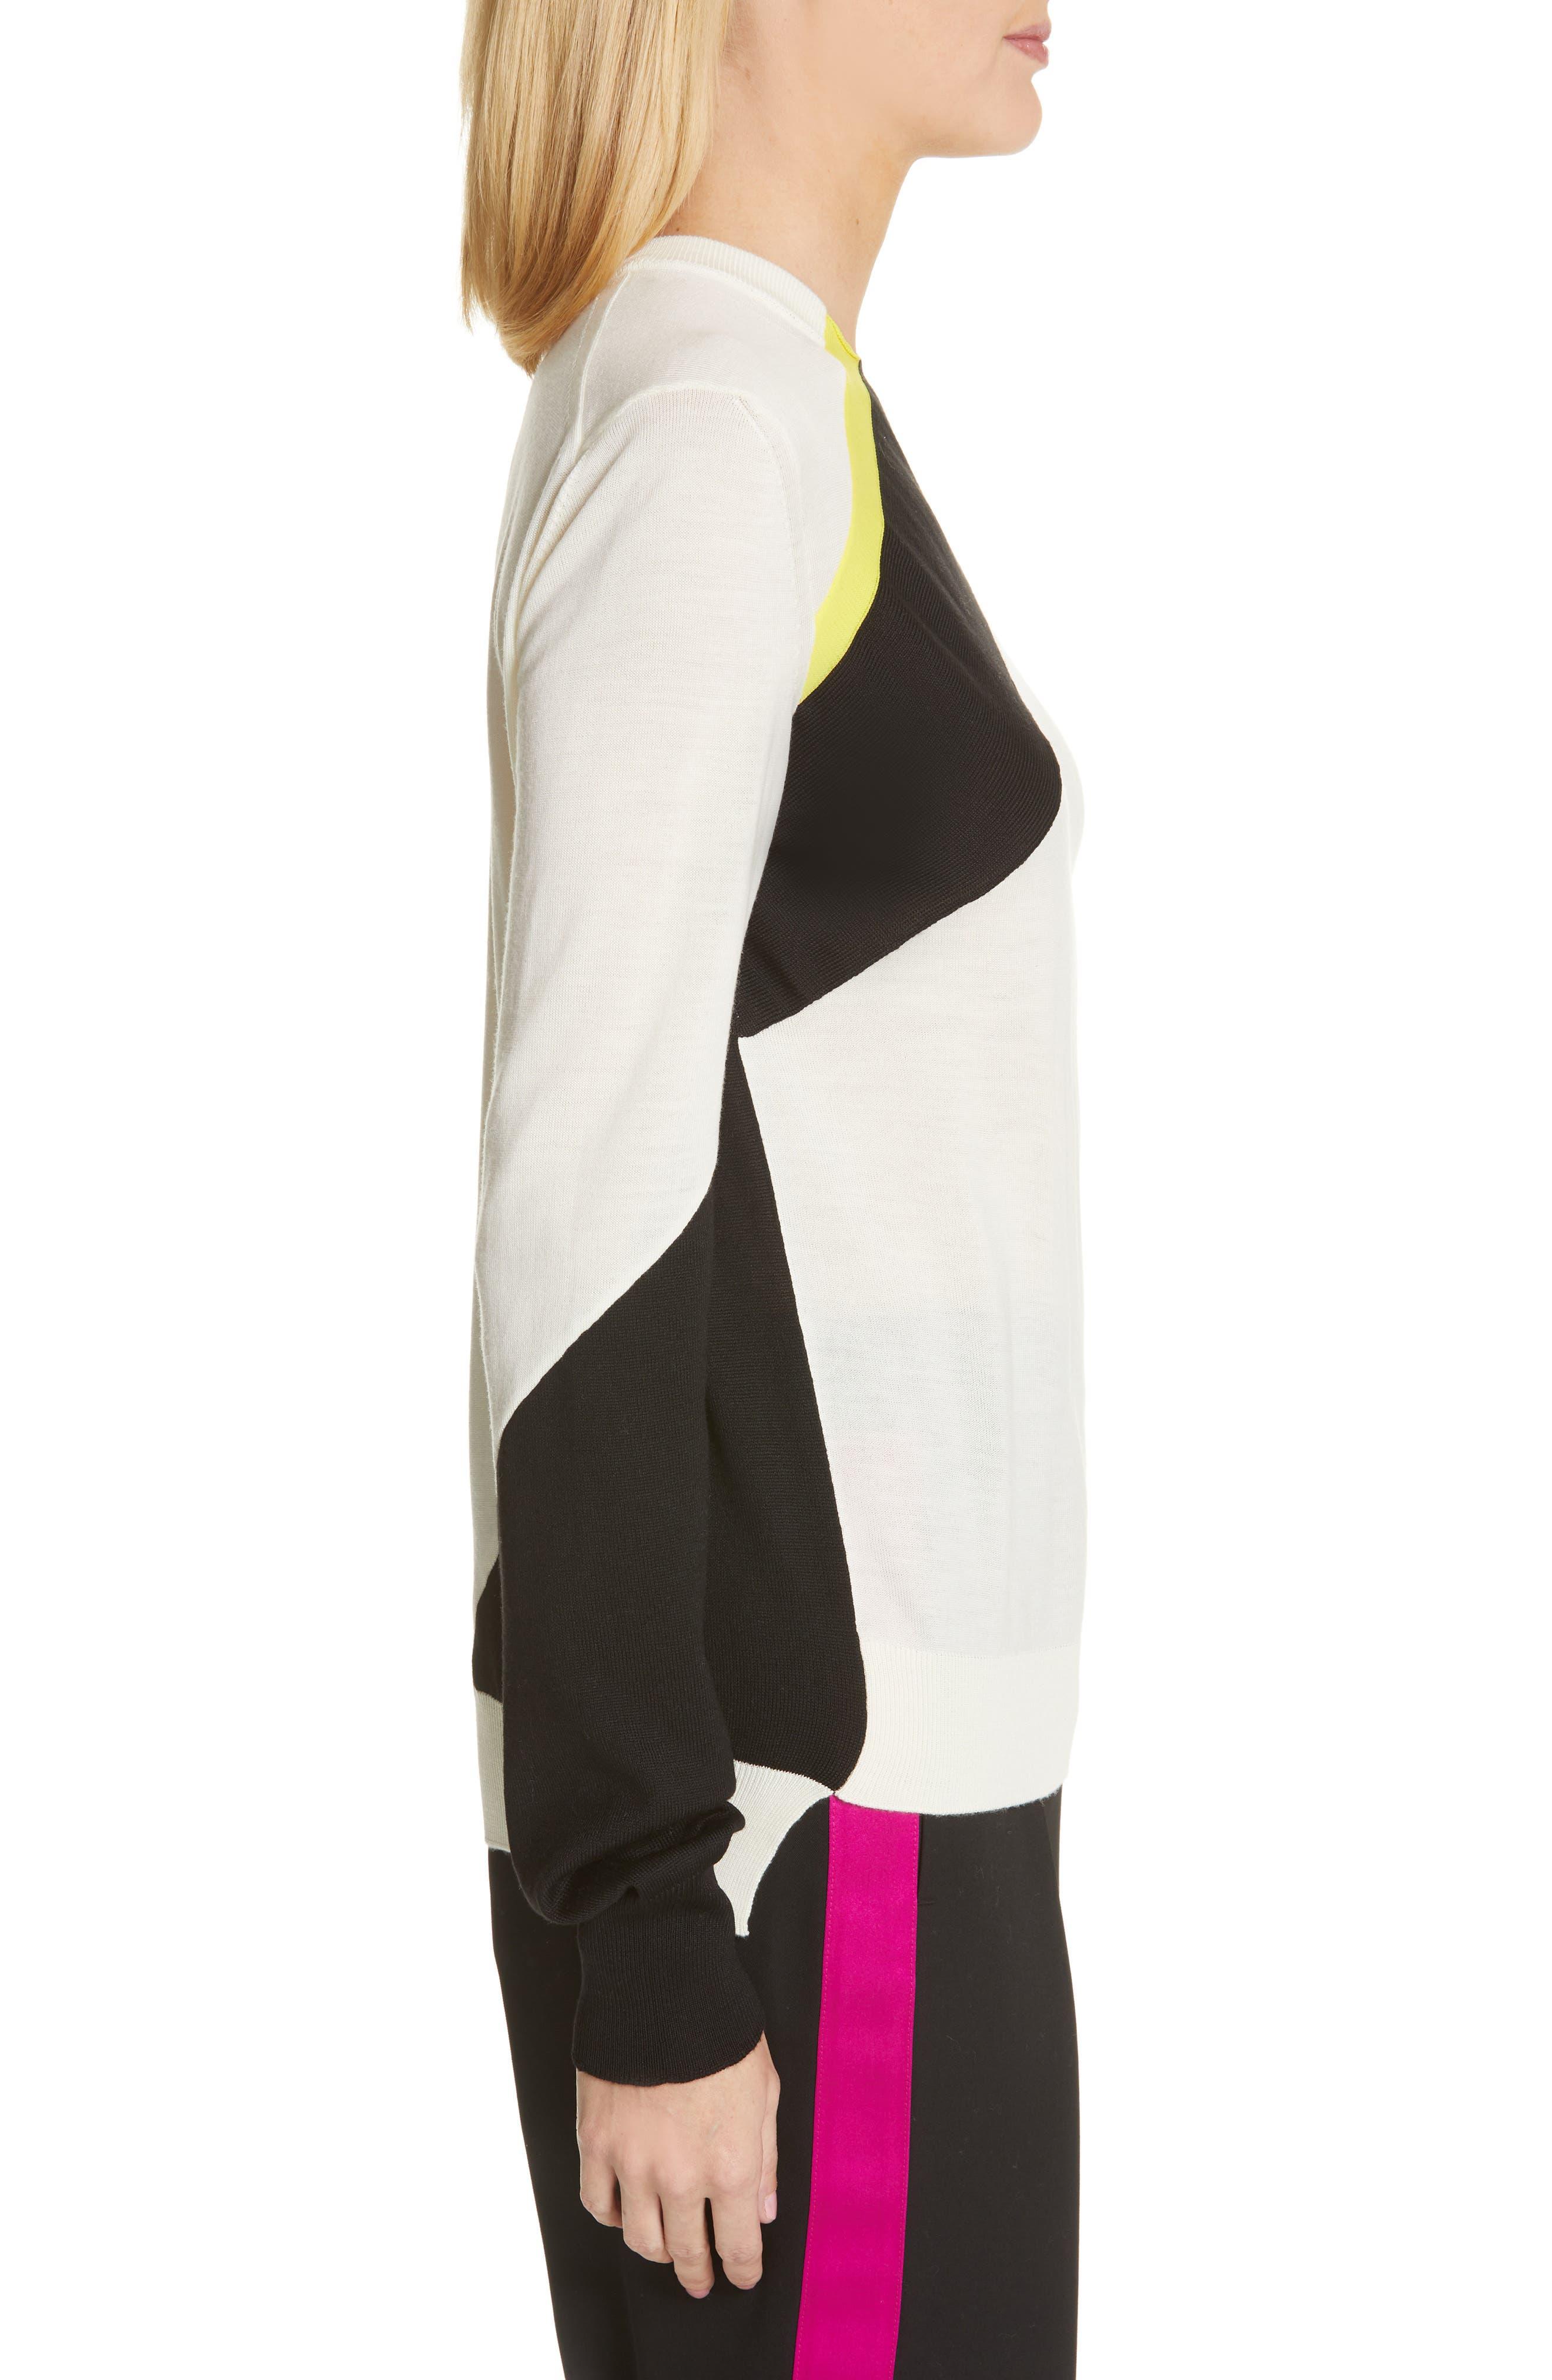 CALVIN KLEIN 205W39NYC, Contrast Stripe Wool Blend Sweater, Alternate thumbnail 4, color, WHITE BLACK TOURNESOL